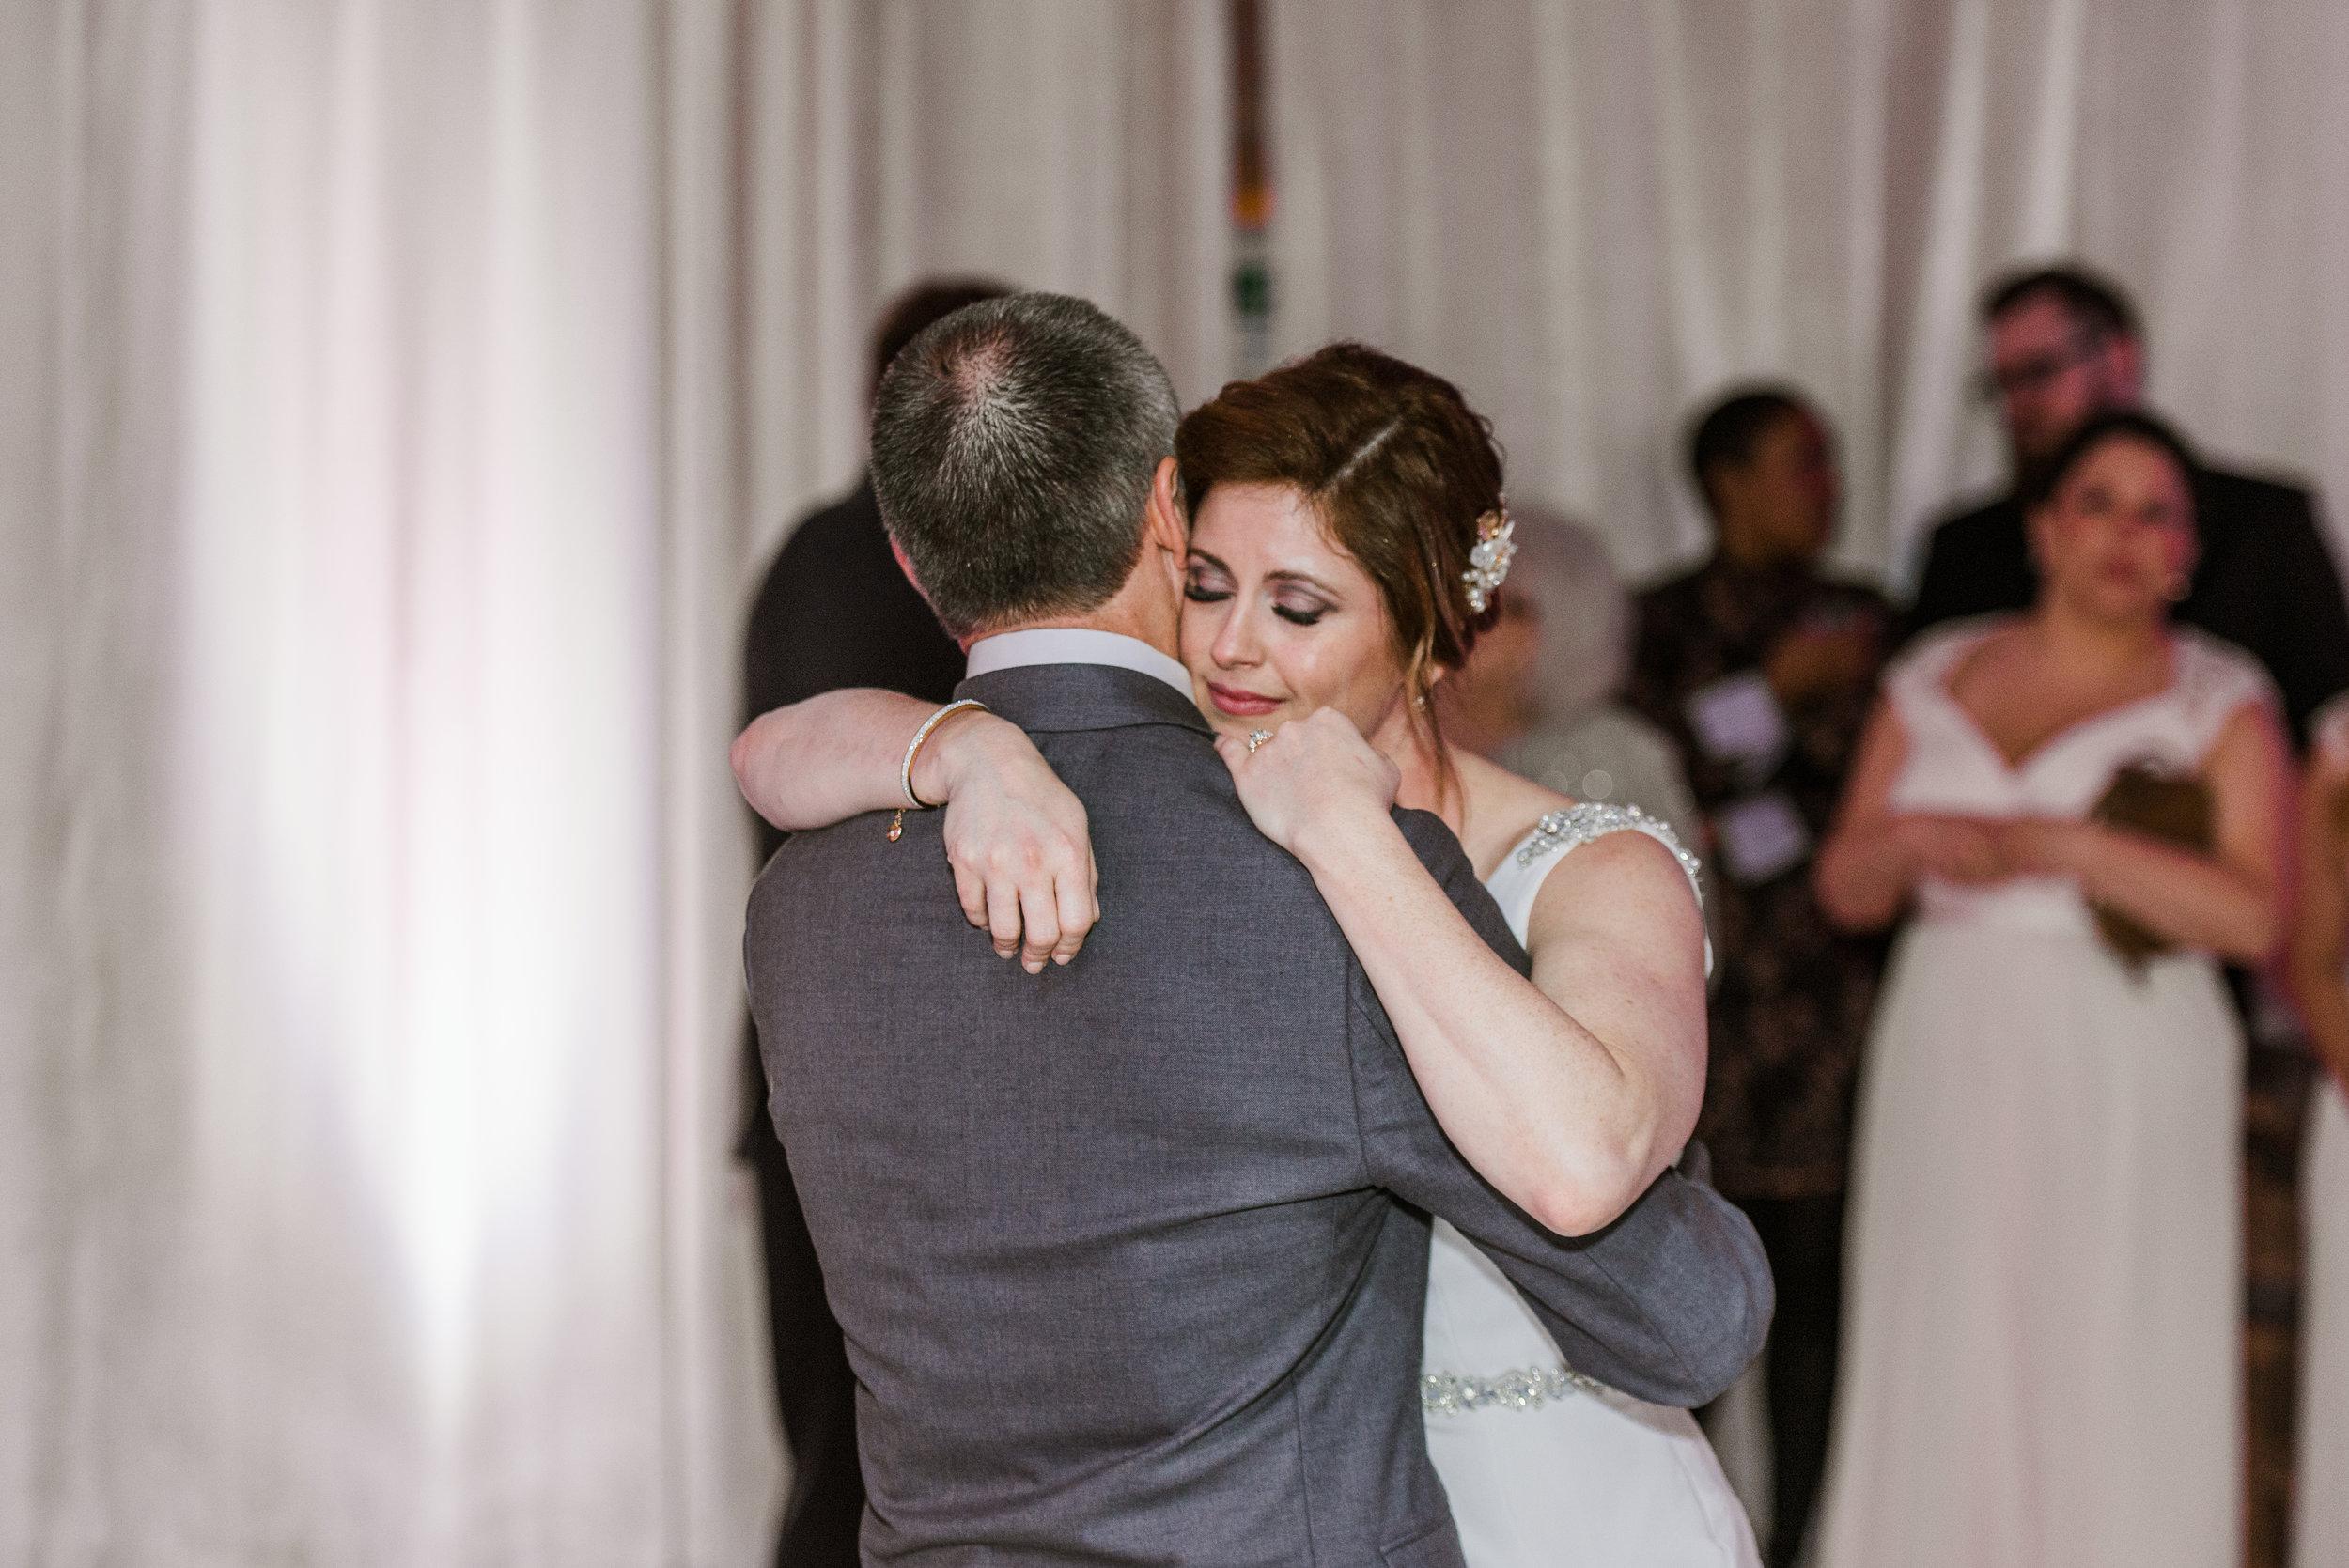 Blake-Graha-Floating-World-Gallery-Chicago-Wedding_Gavyn-Taylor-Photo (11 of 14).jpg